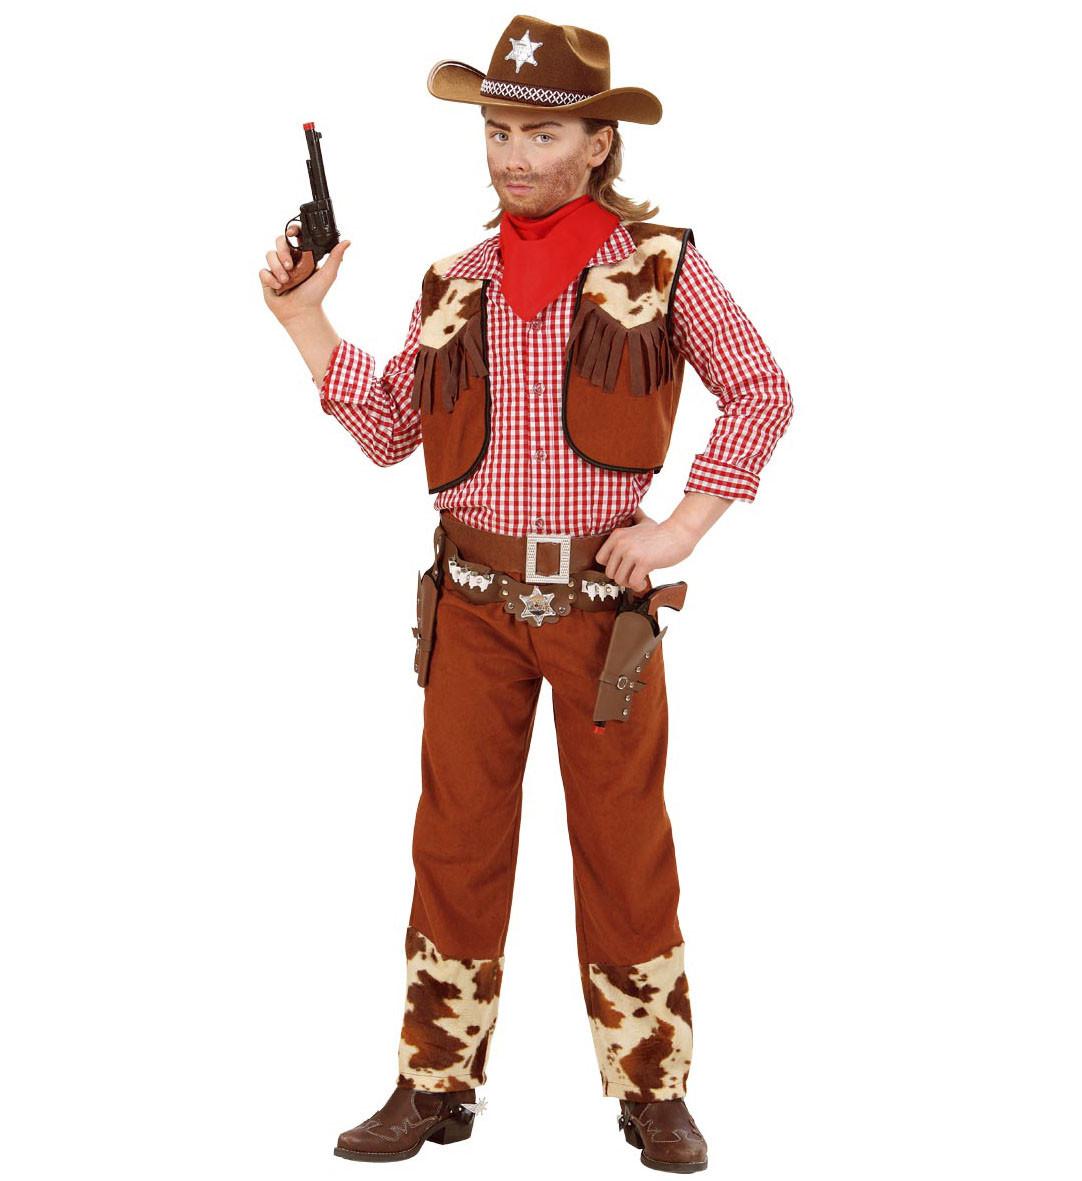 costume carnevale bimbo cowboy ps 24913 far west. Black Bedroom Furniture Sets. Home Design Ideas